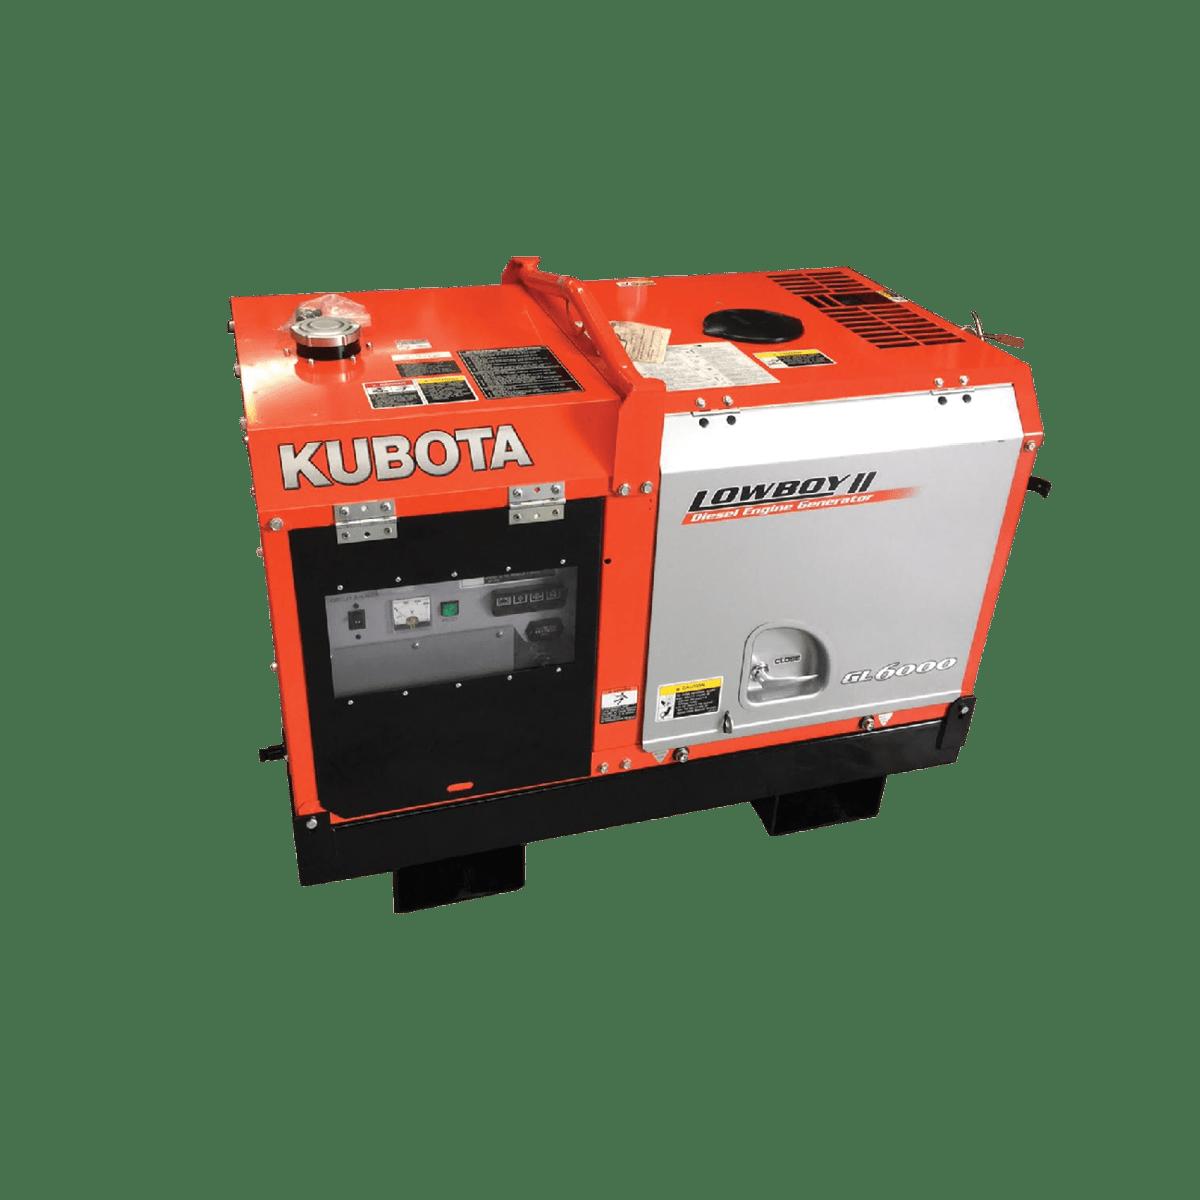 6KVA Kubota Lowboy Diesel Generator- Mine Spec   Blue Diamond